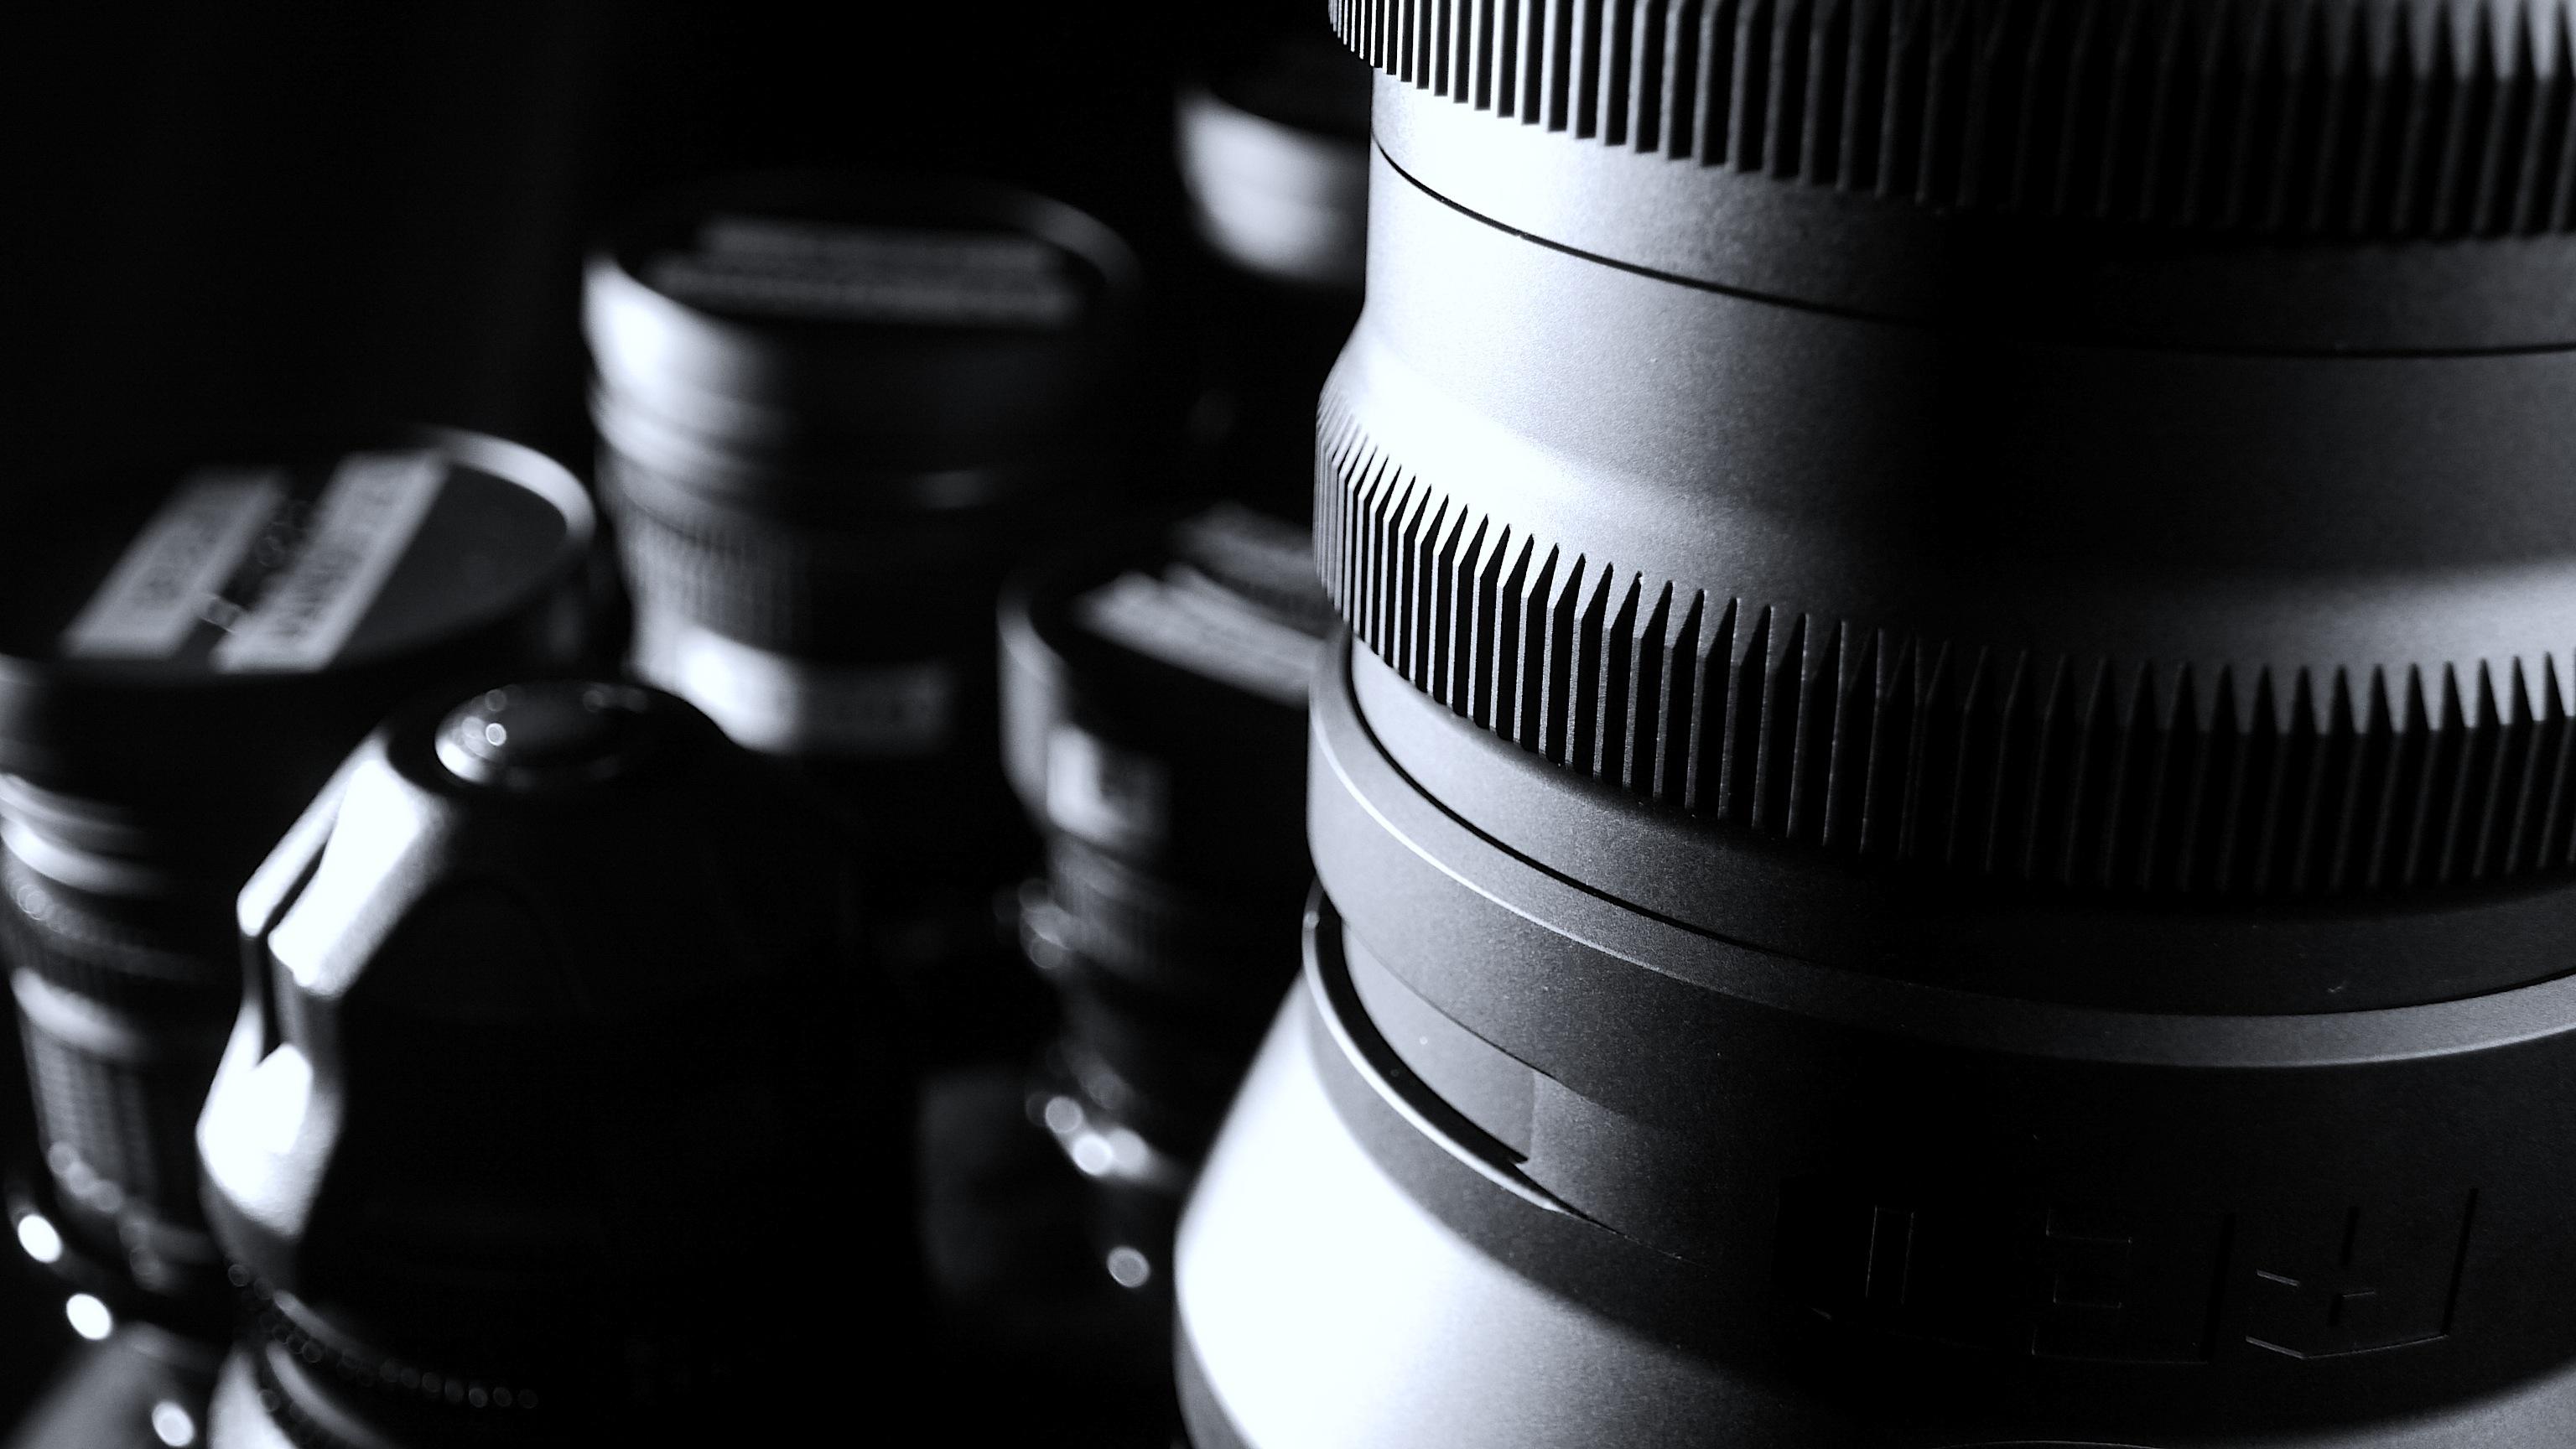 A Mount lenses